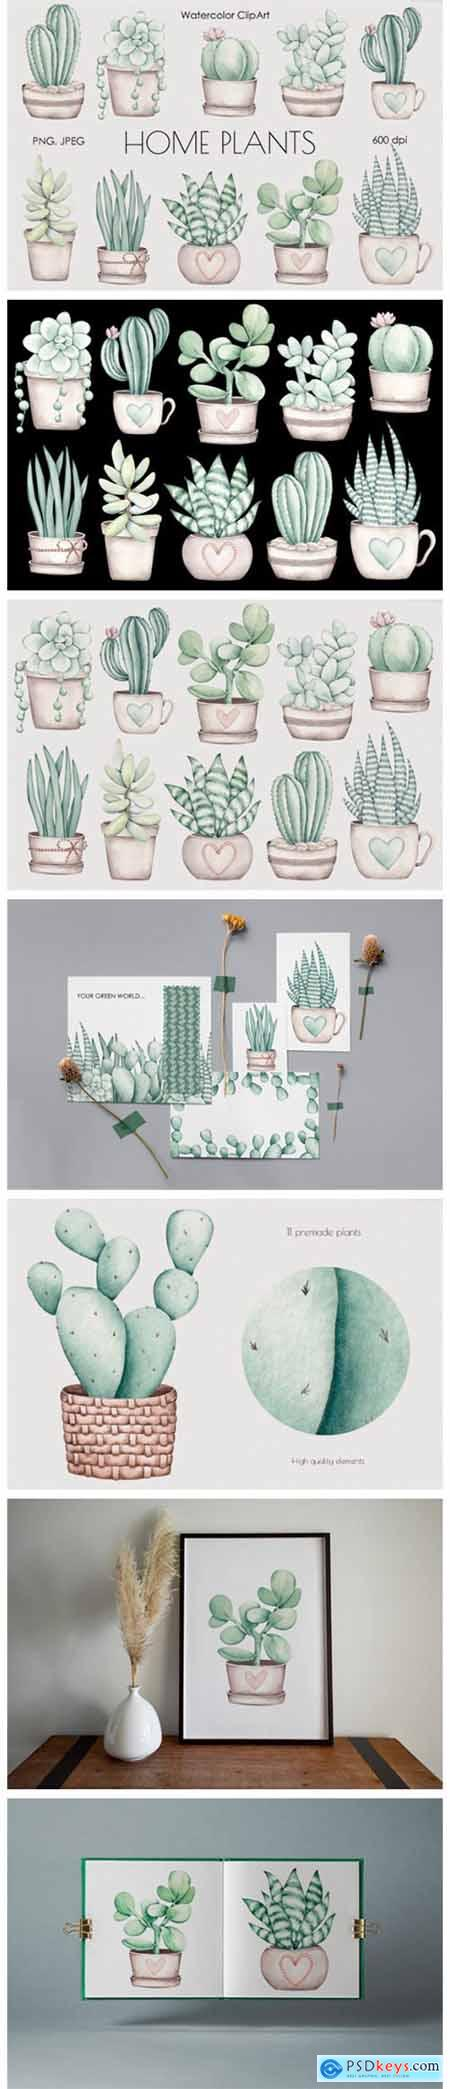 Watercolor ClipArt Home Plants 11785135